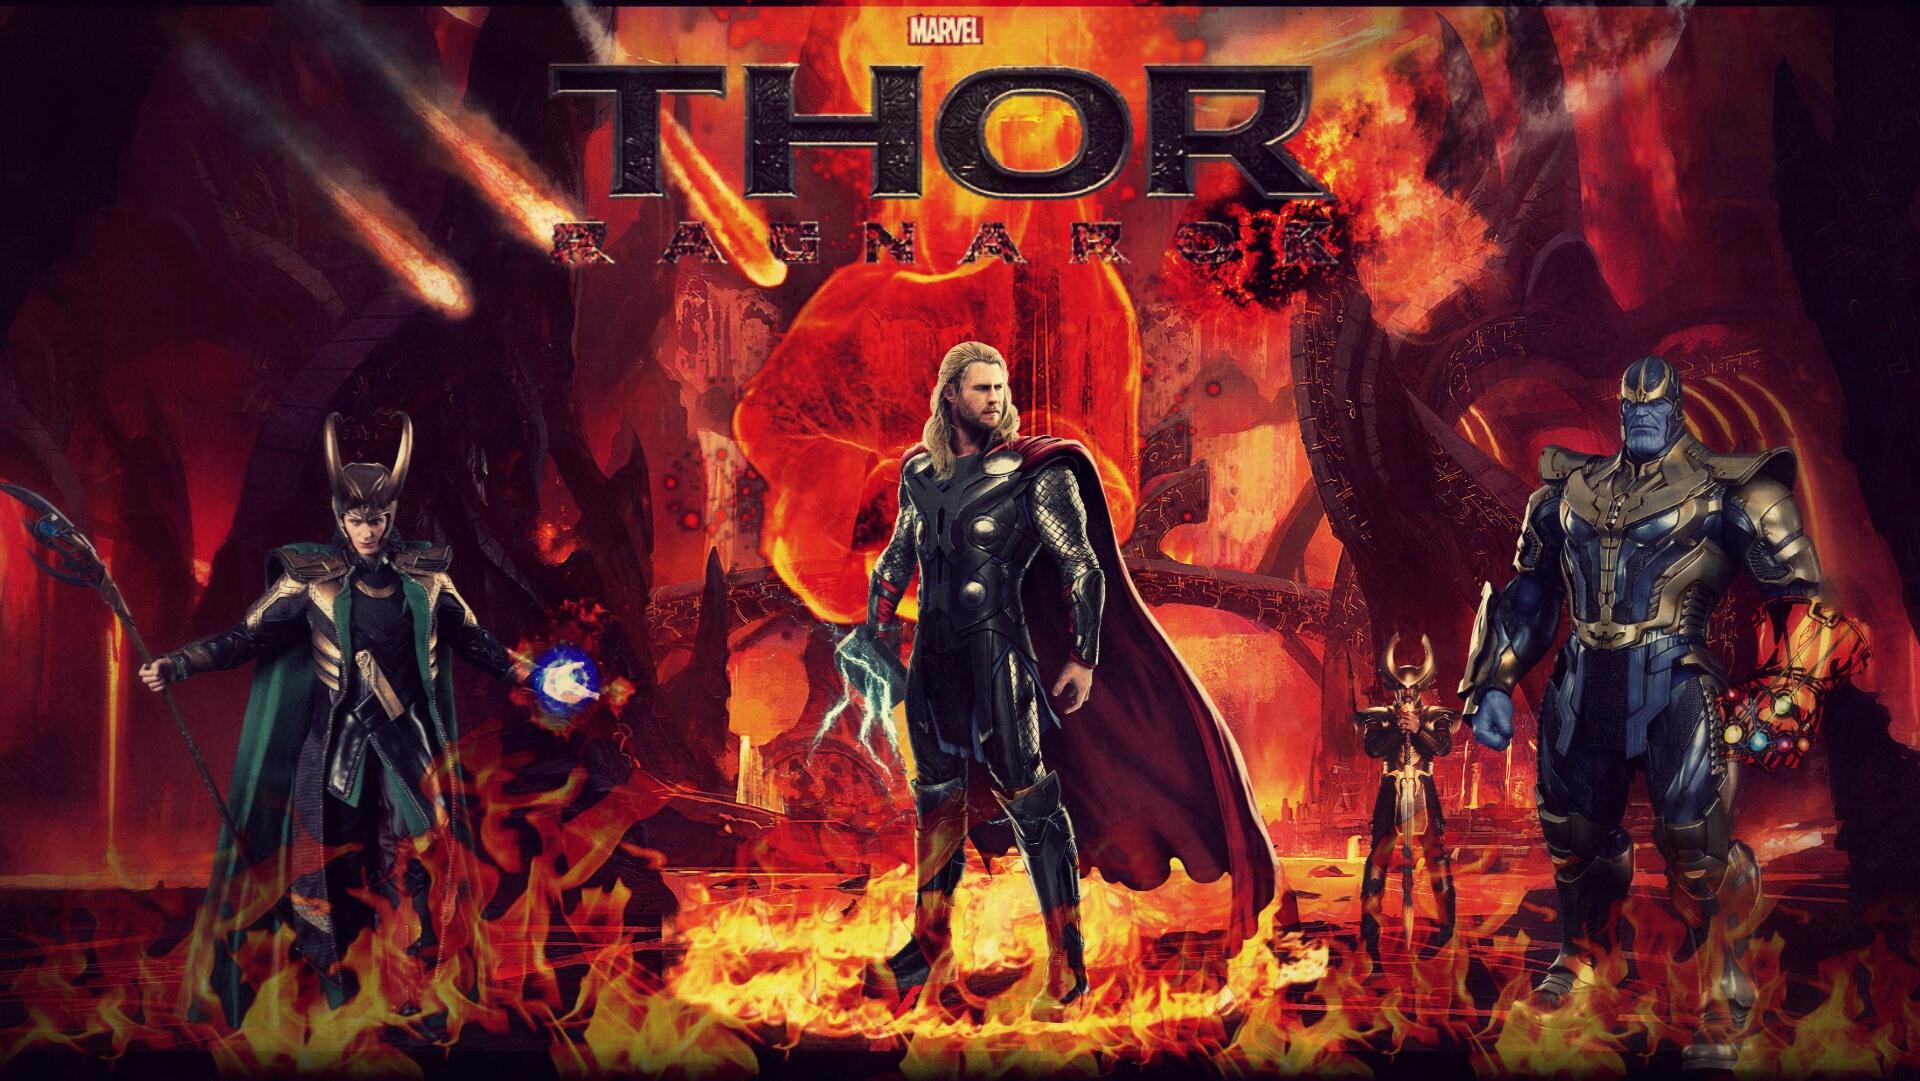 Thor ragnarok hd wallpaper by theincrediblejake on deviantart - Thor ragnarok hd wallpapers download ...